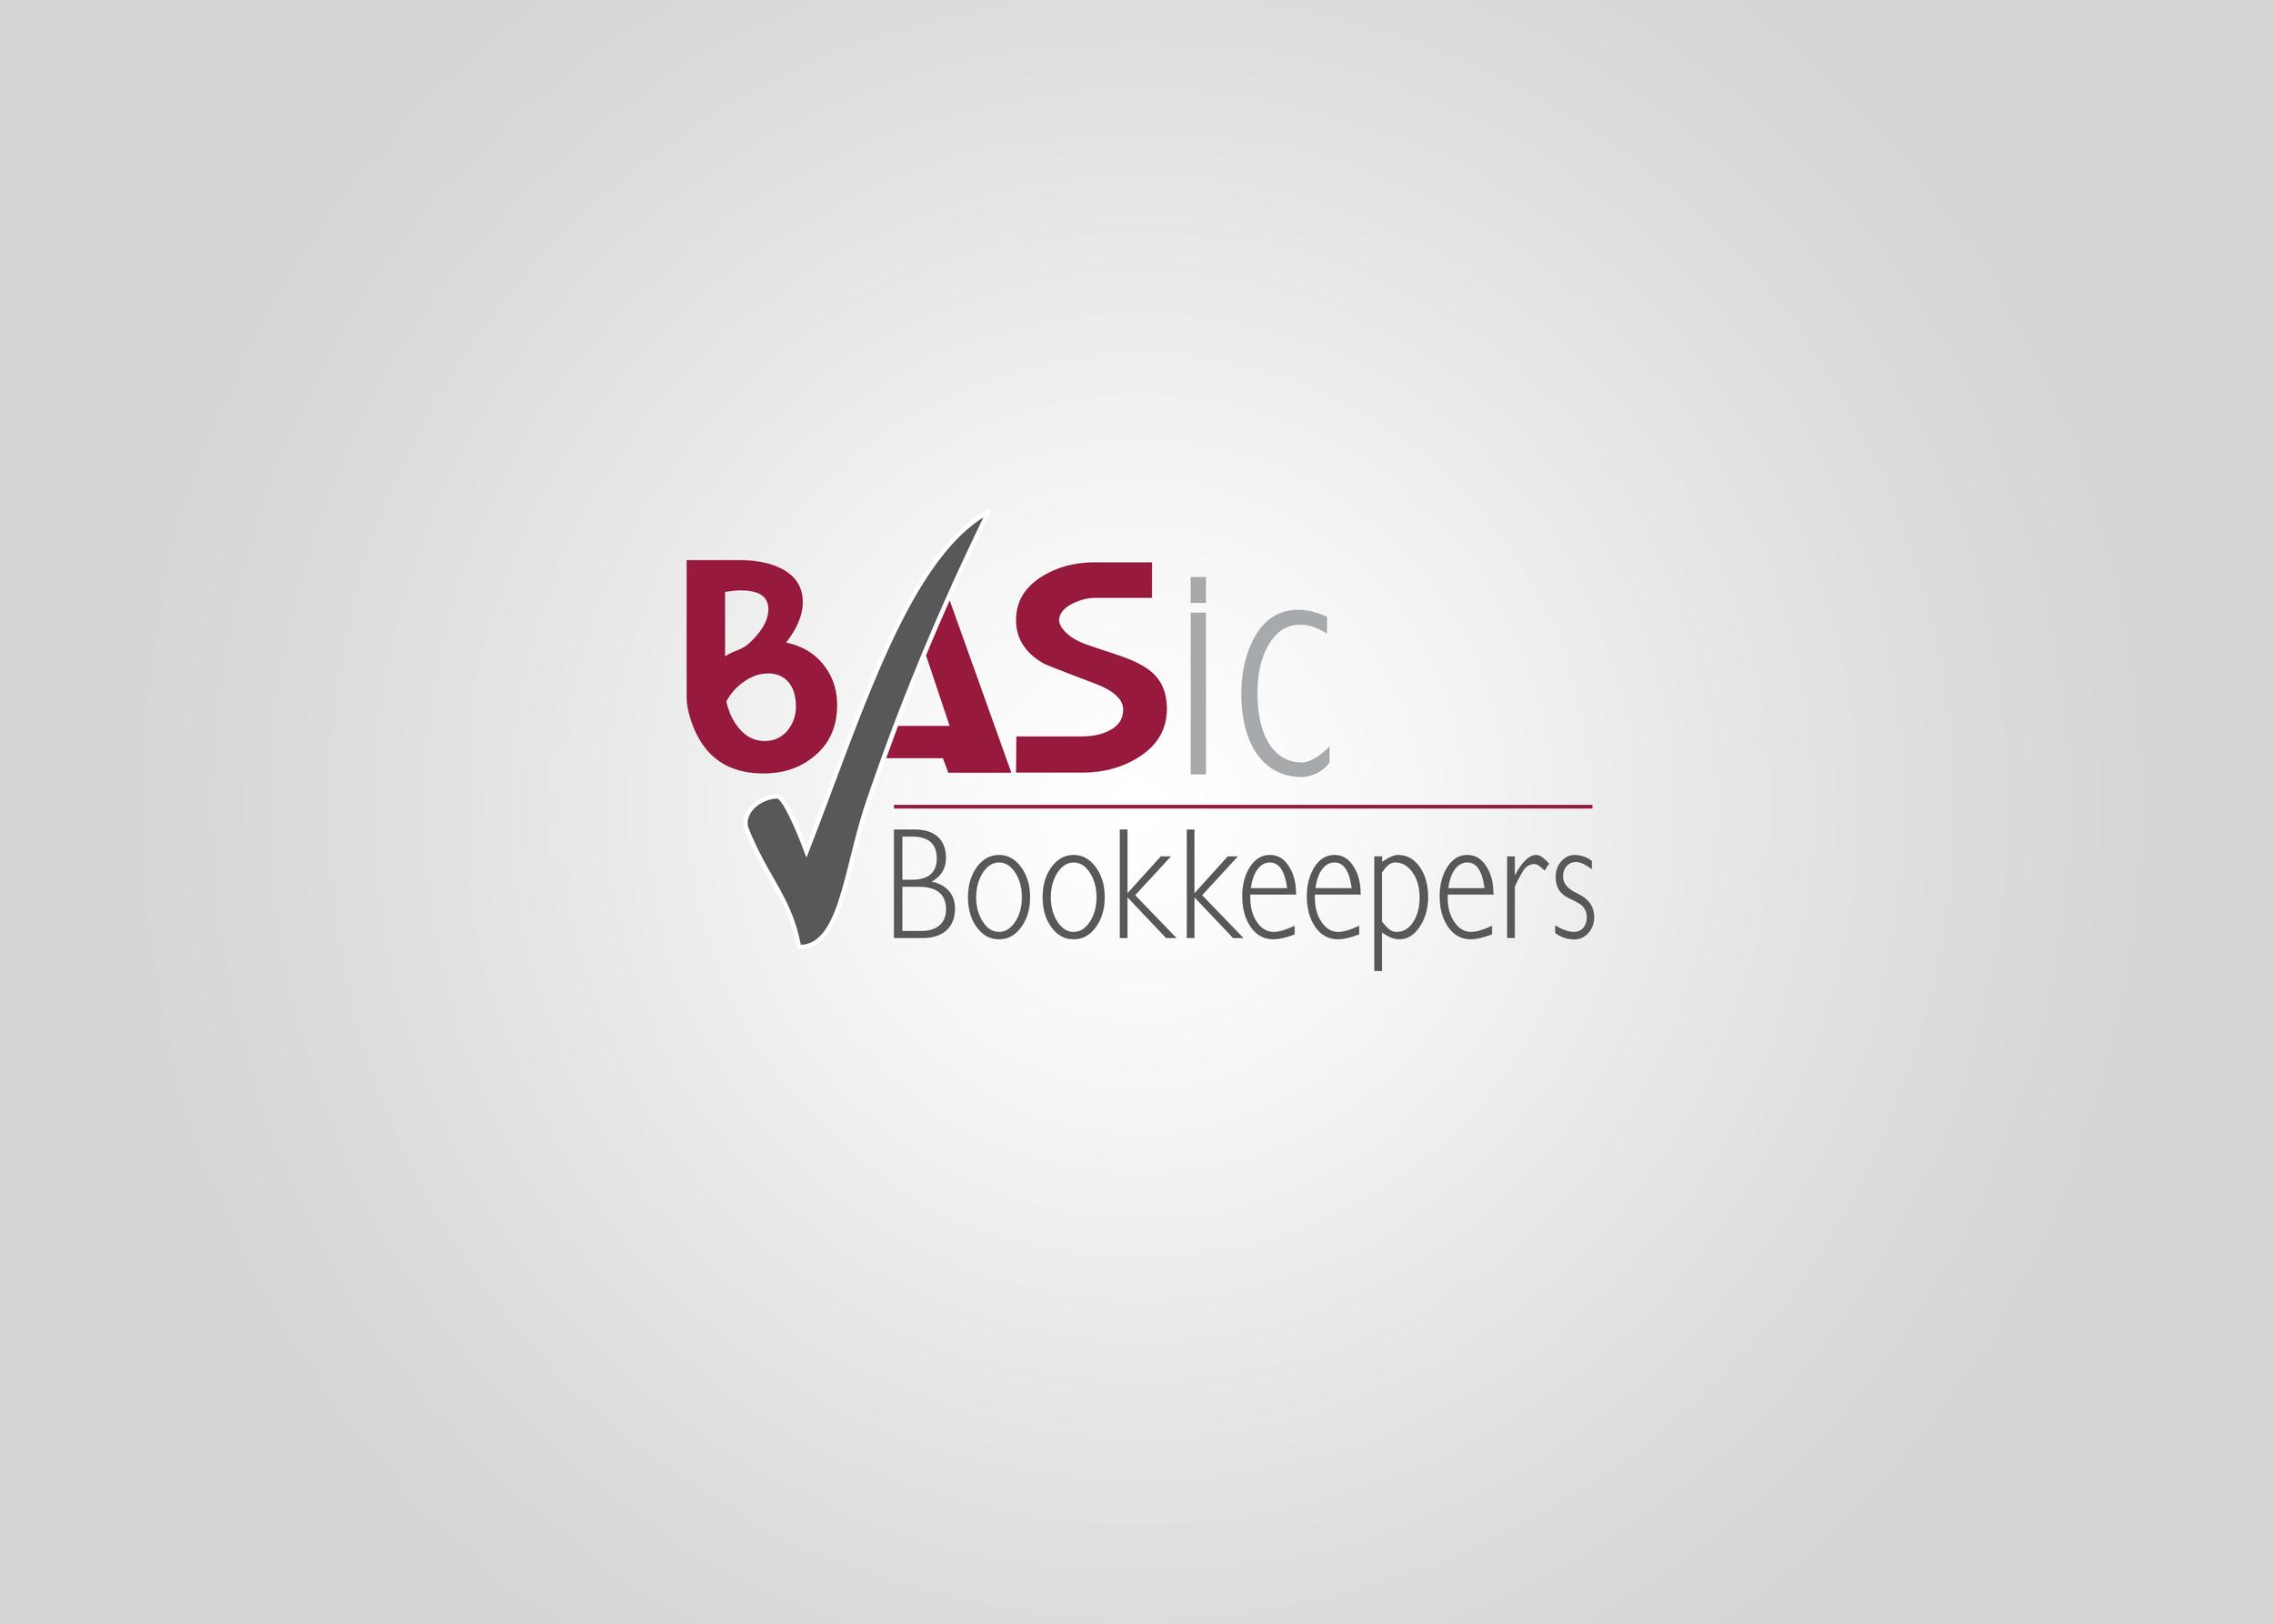 Basic Bookeepers.jpg